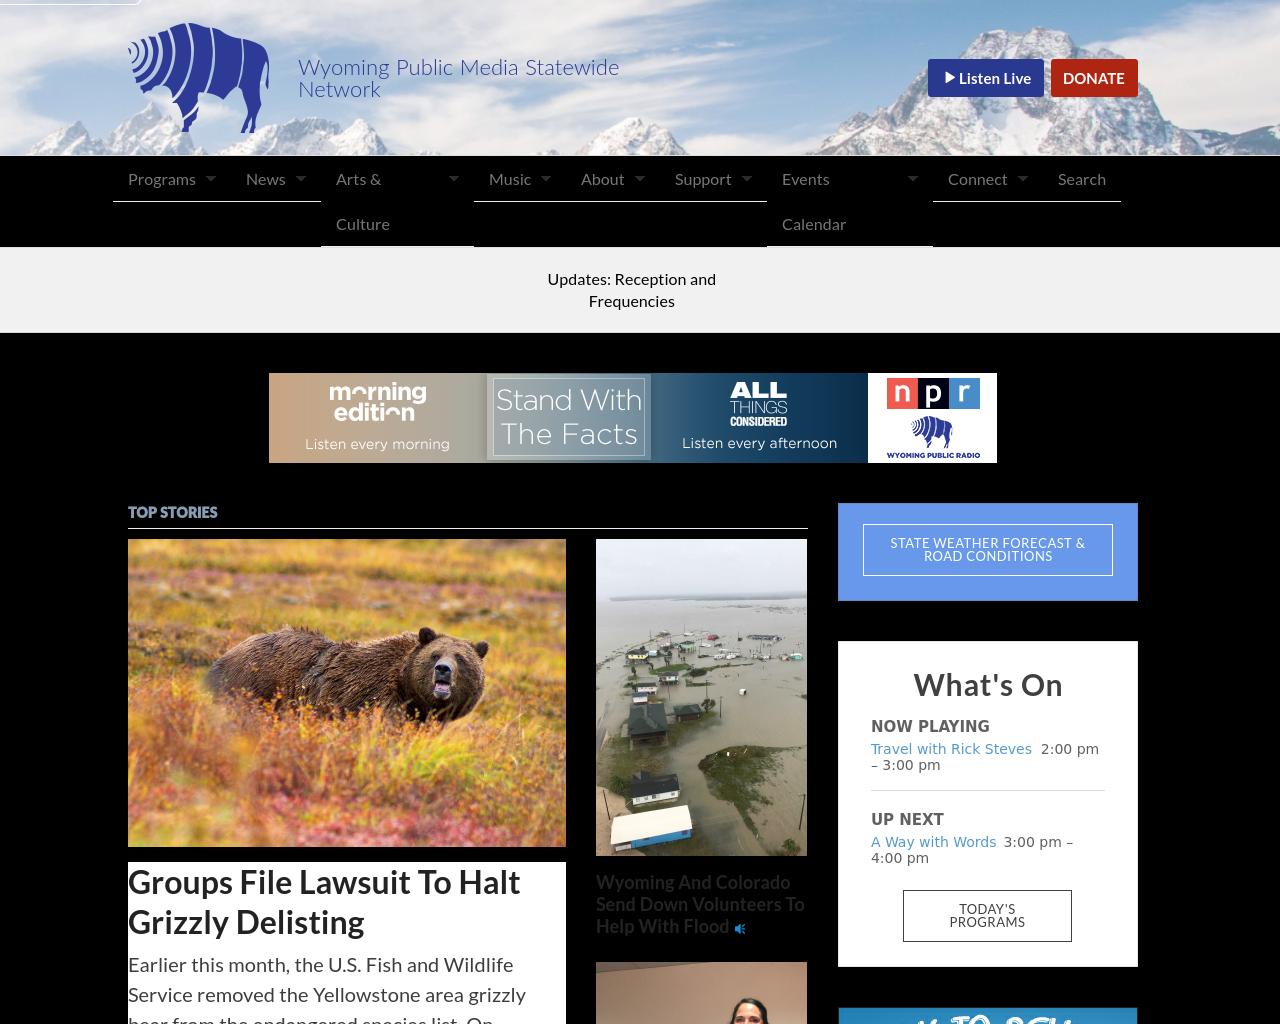 Wyomingpublicmedia.net-Advertising-Reviews-Pricing